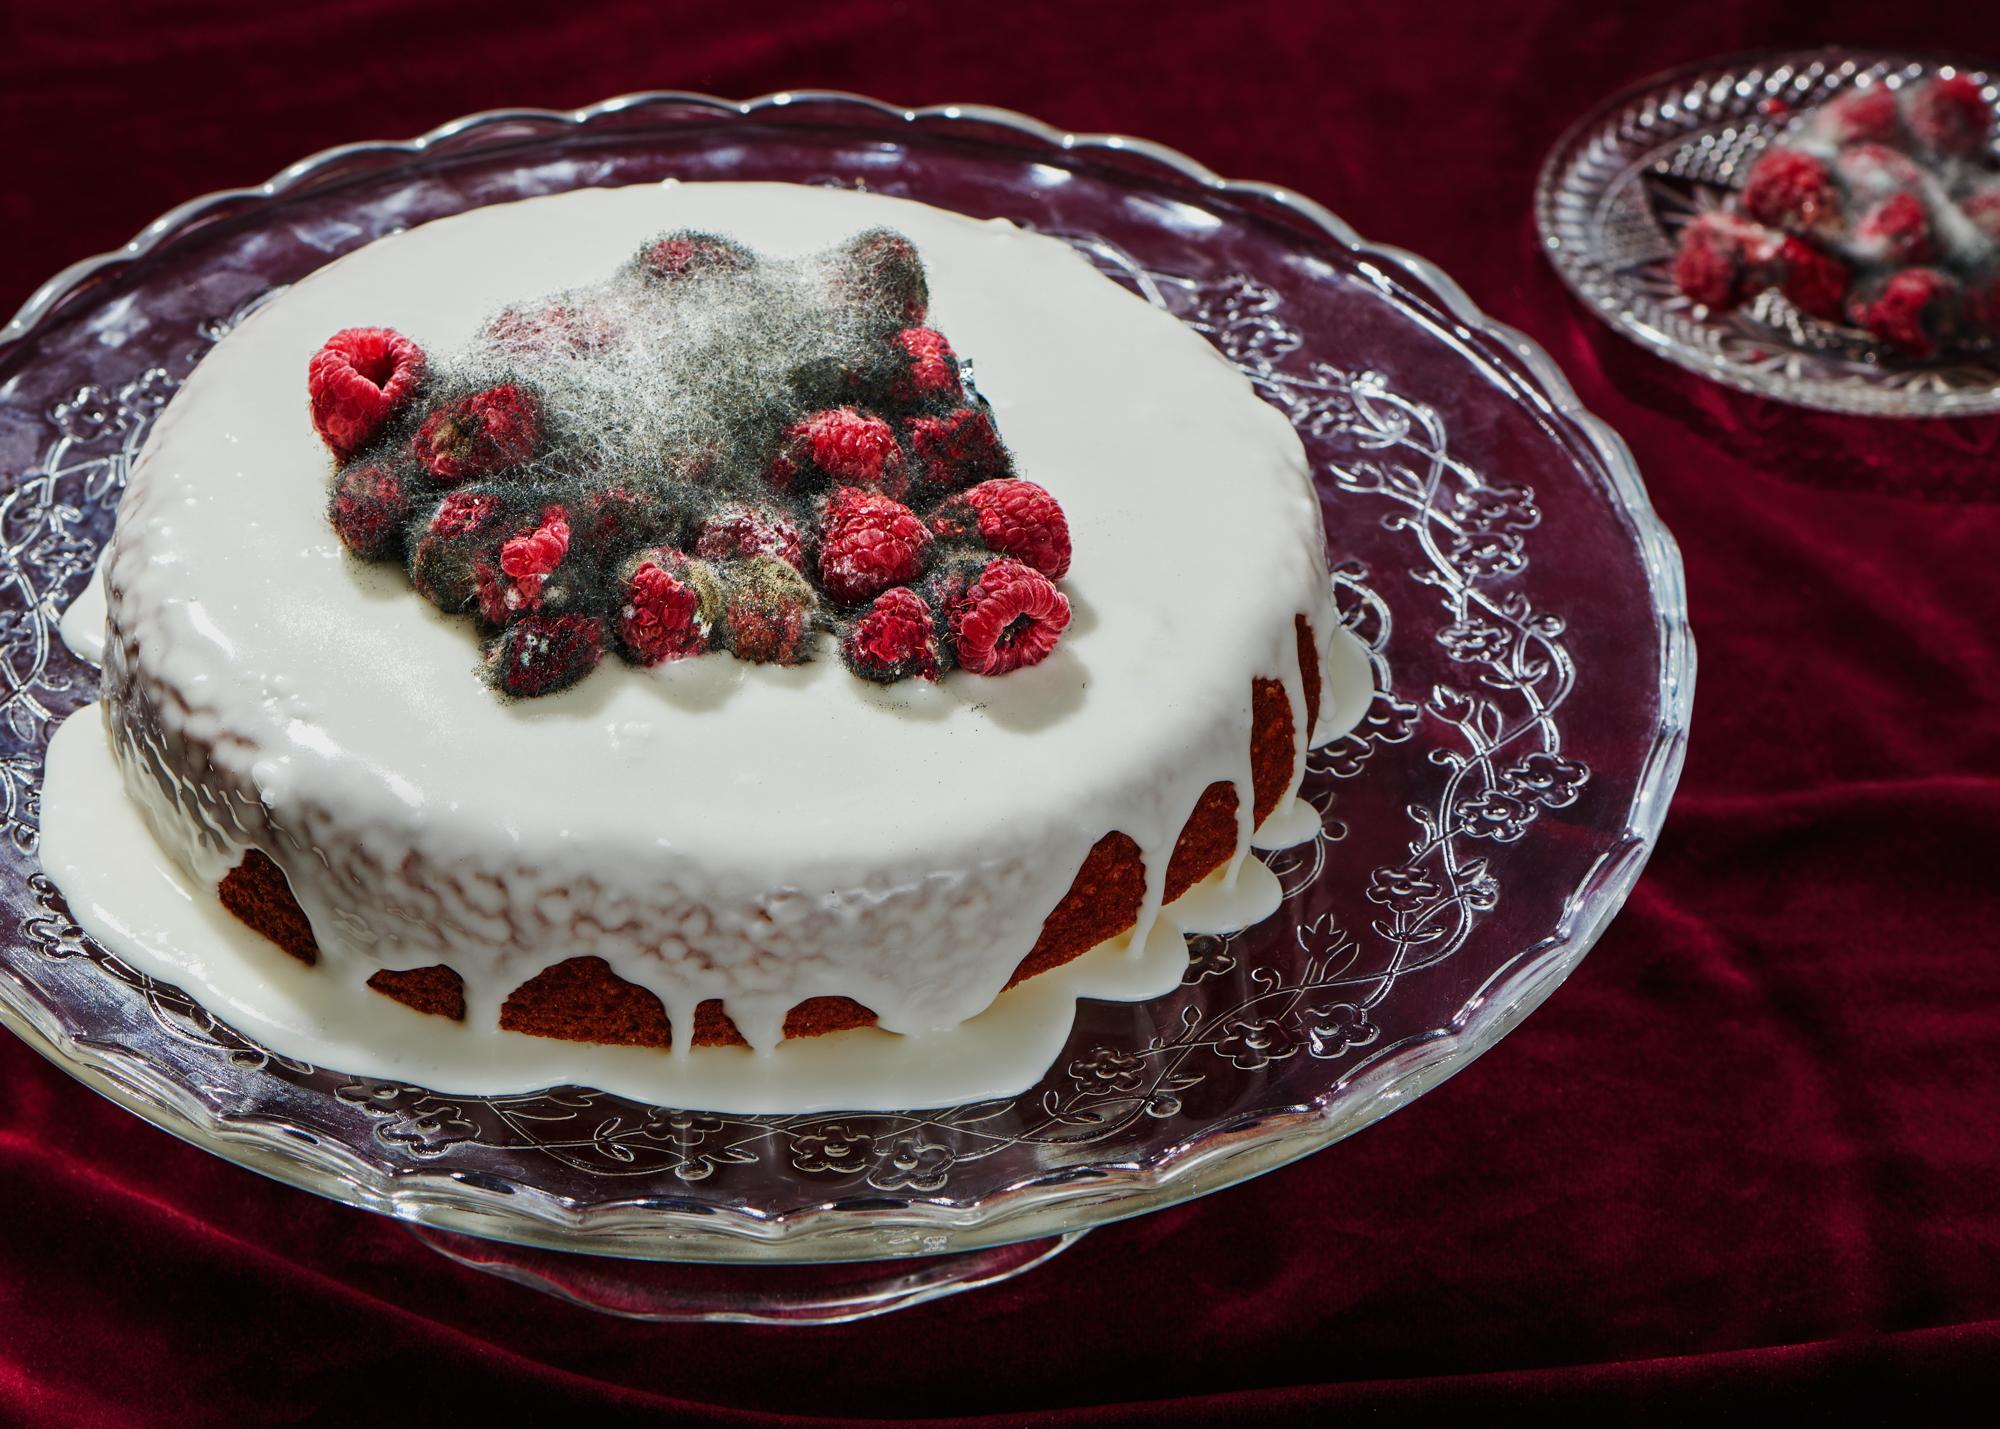 Spoiled-Rotten-Cake-Yasara-Gunawardena